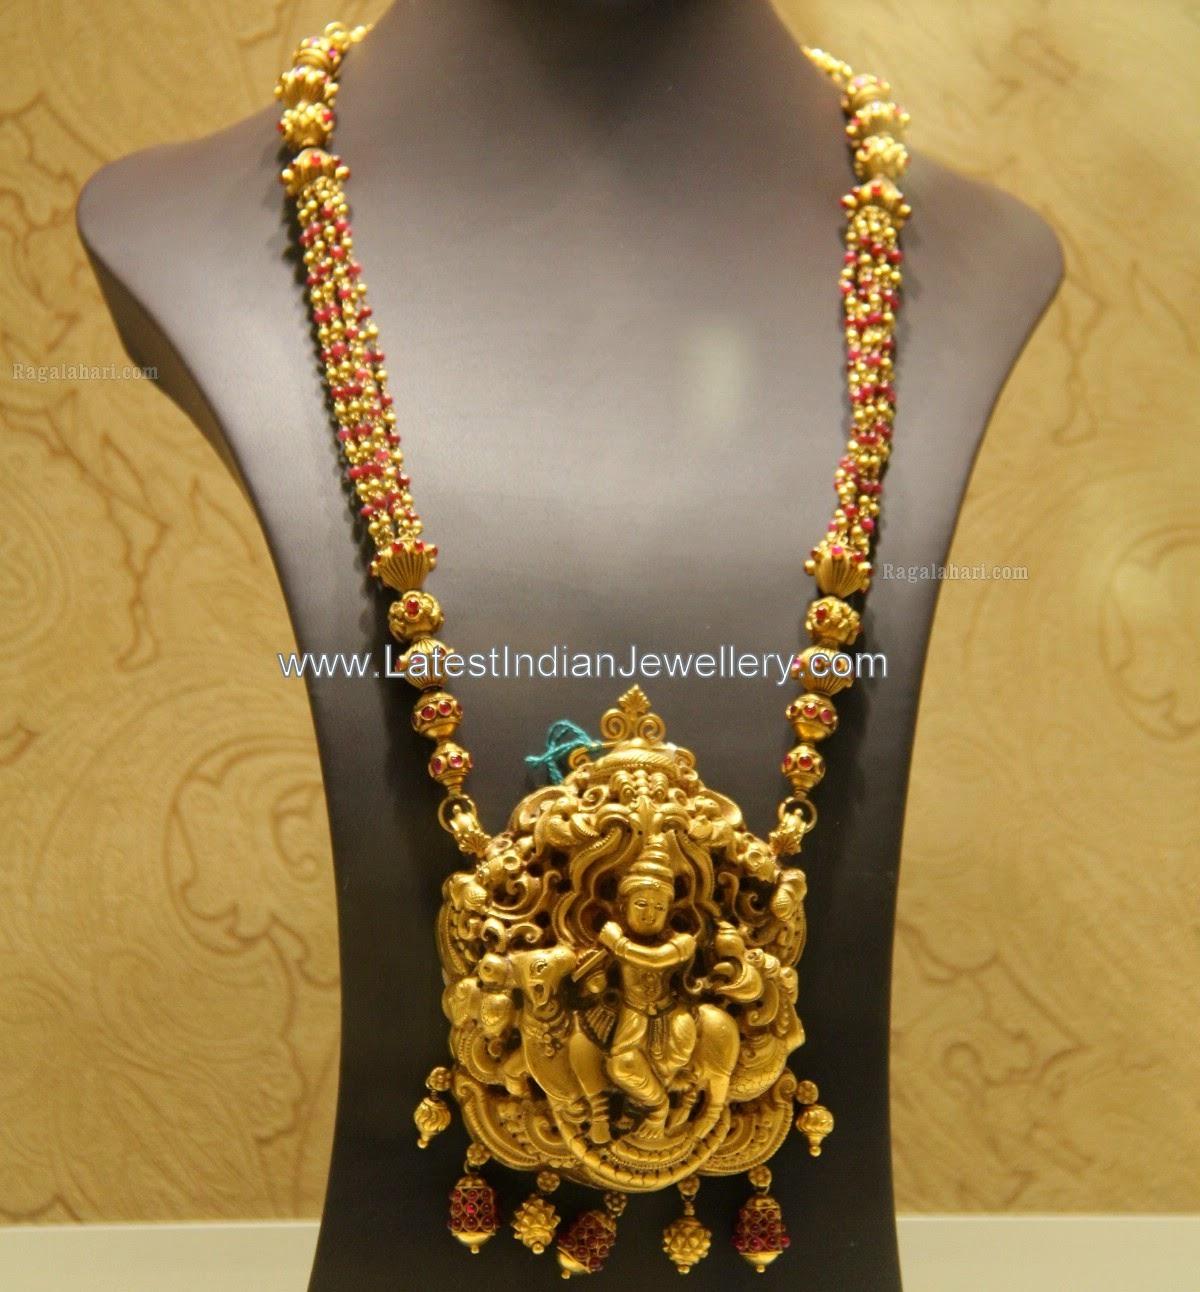 Gold Beads Haram with Krishna Pendant